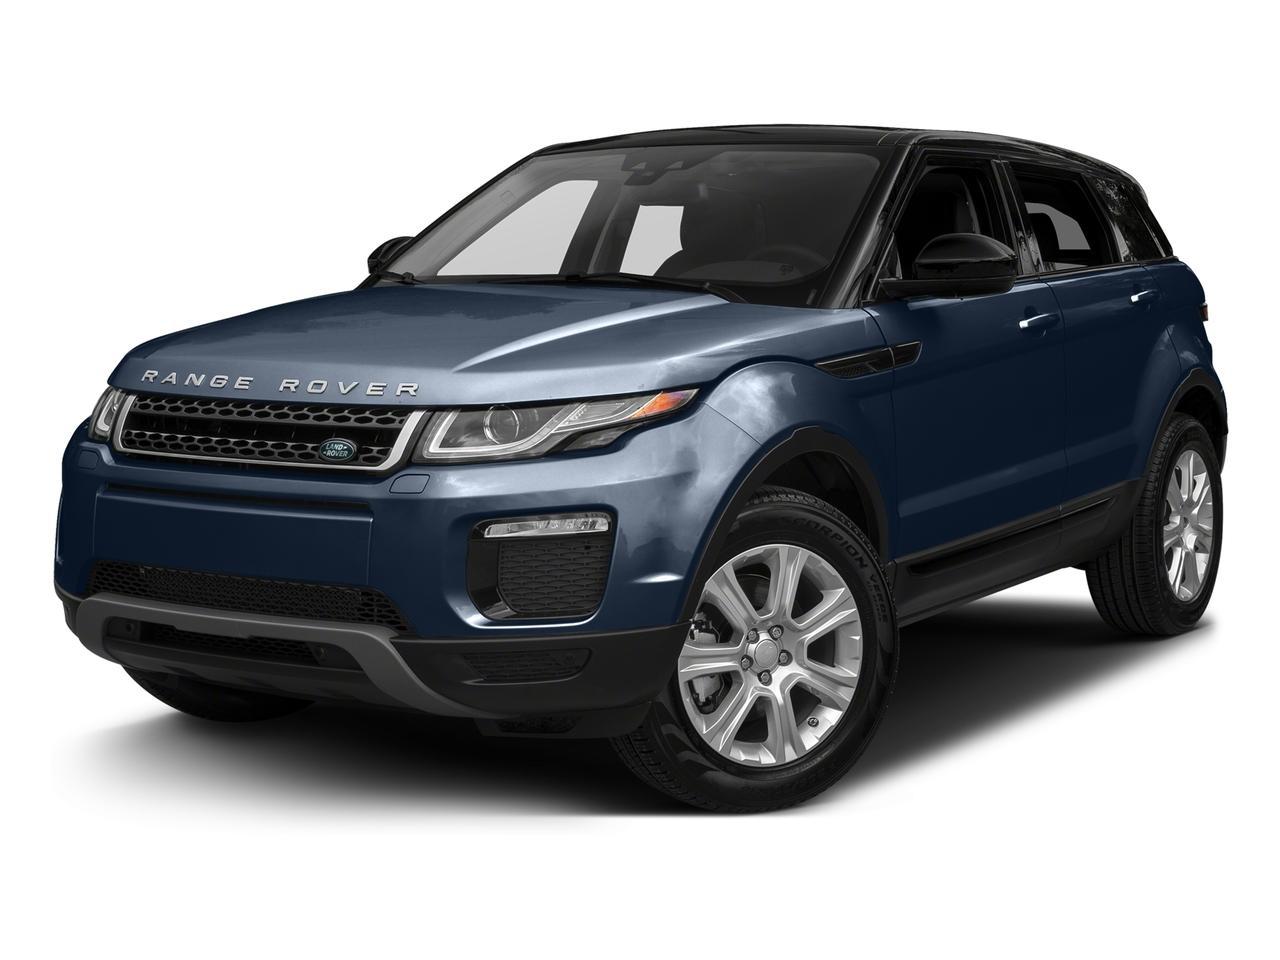 2017 Land Rover Range Rover Evoque Vehicle Photo in Pleasanton, CA 94588